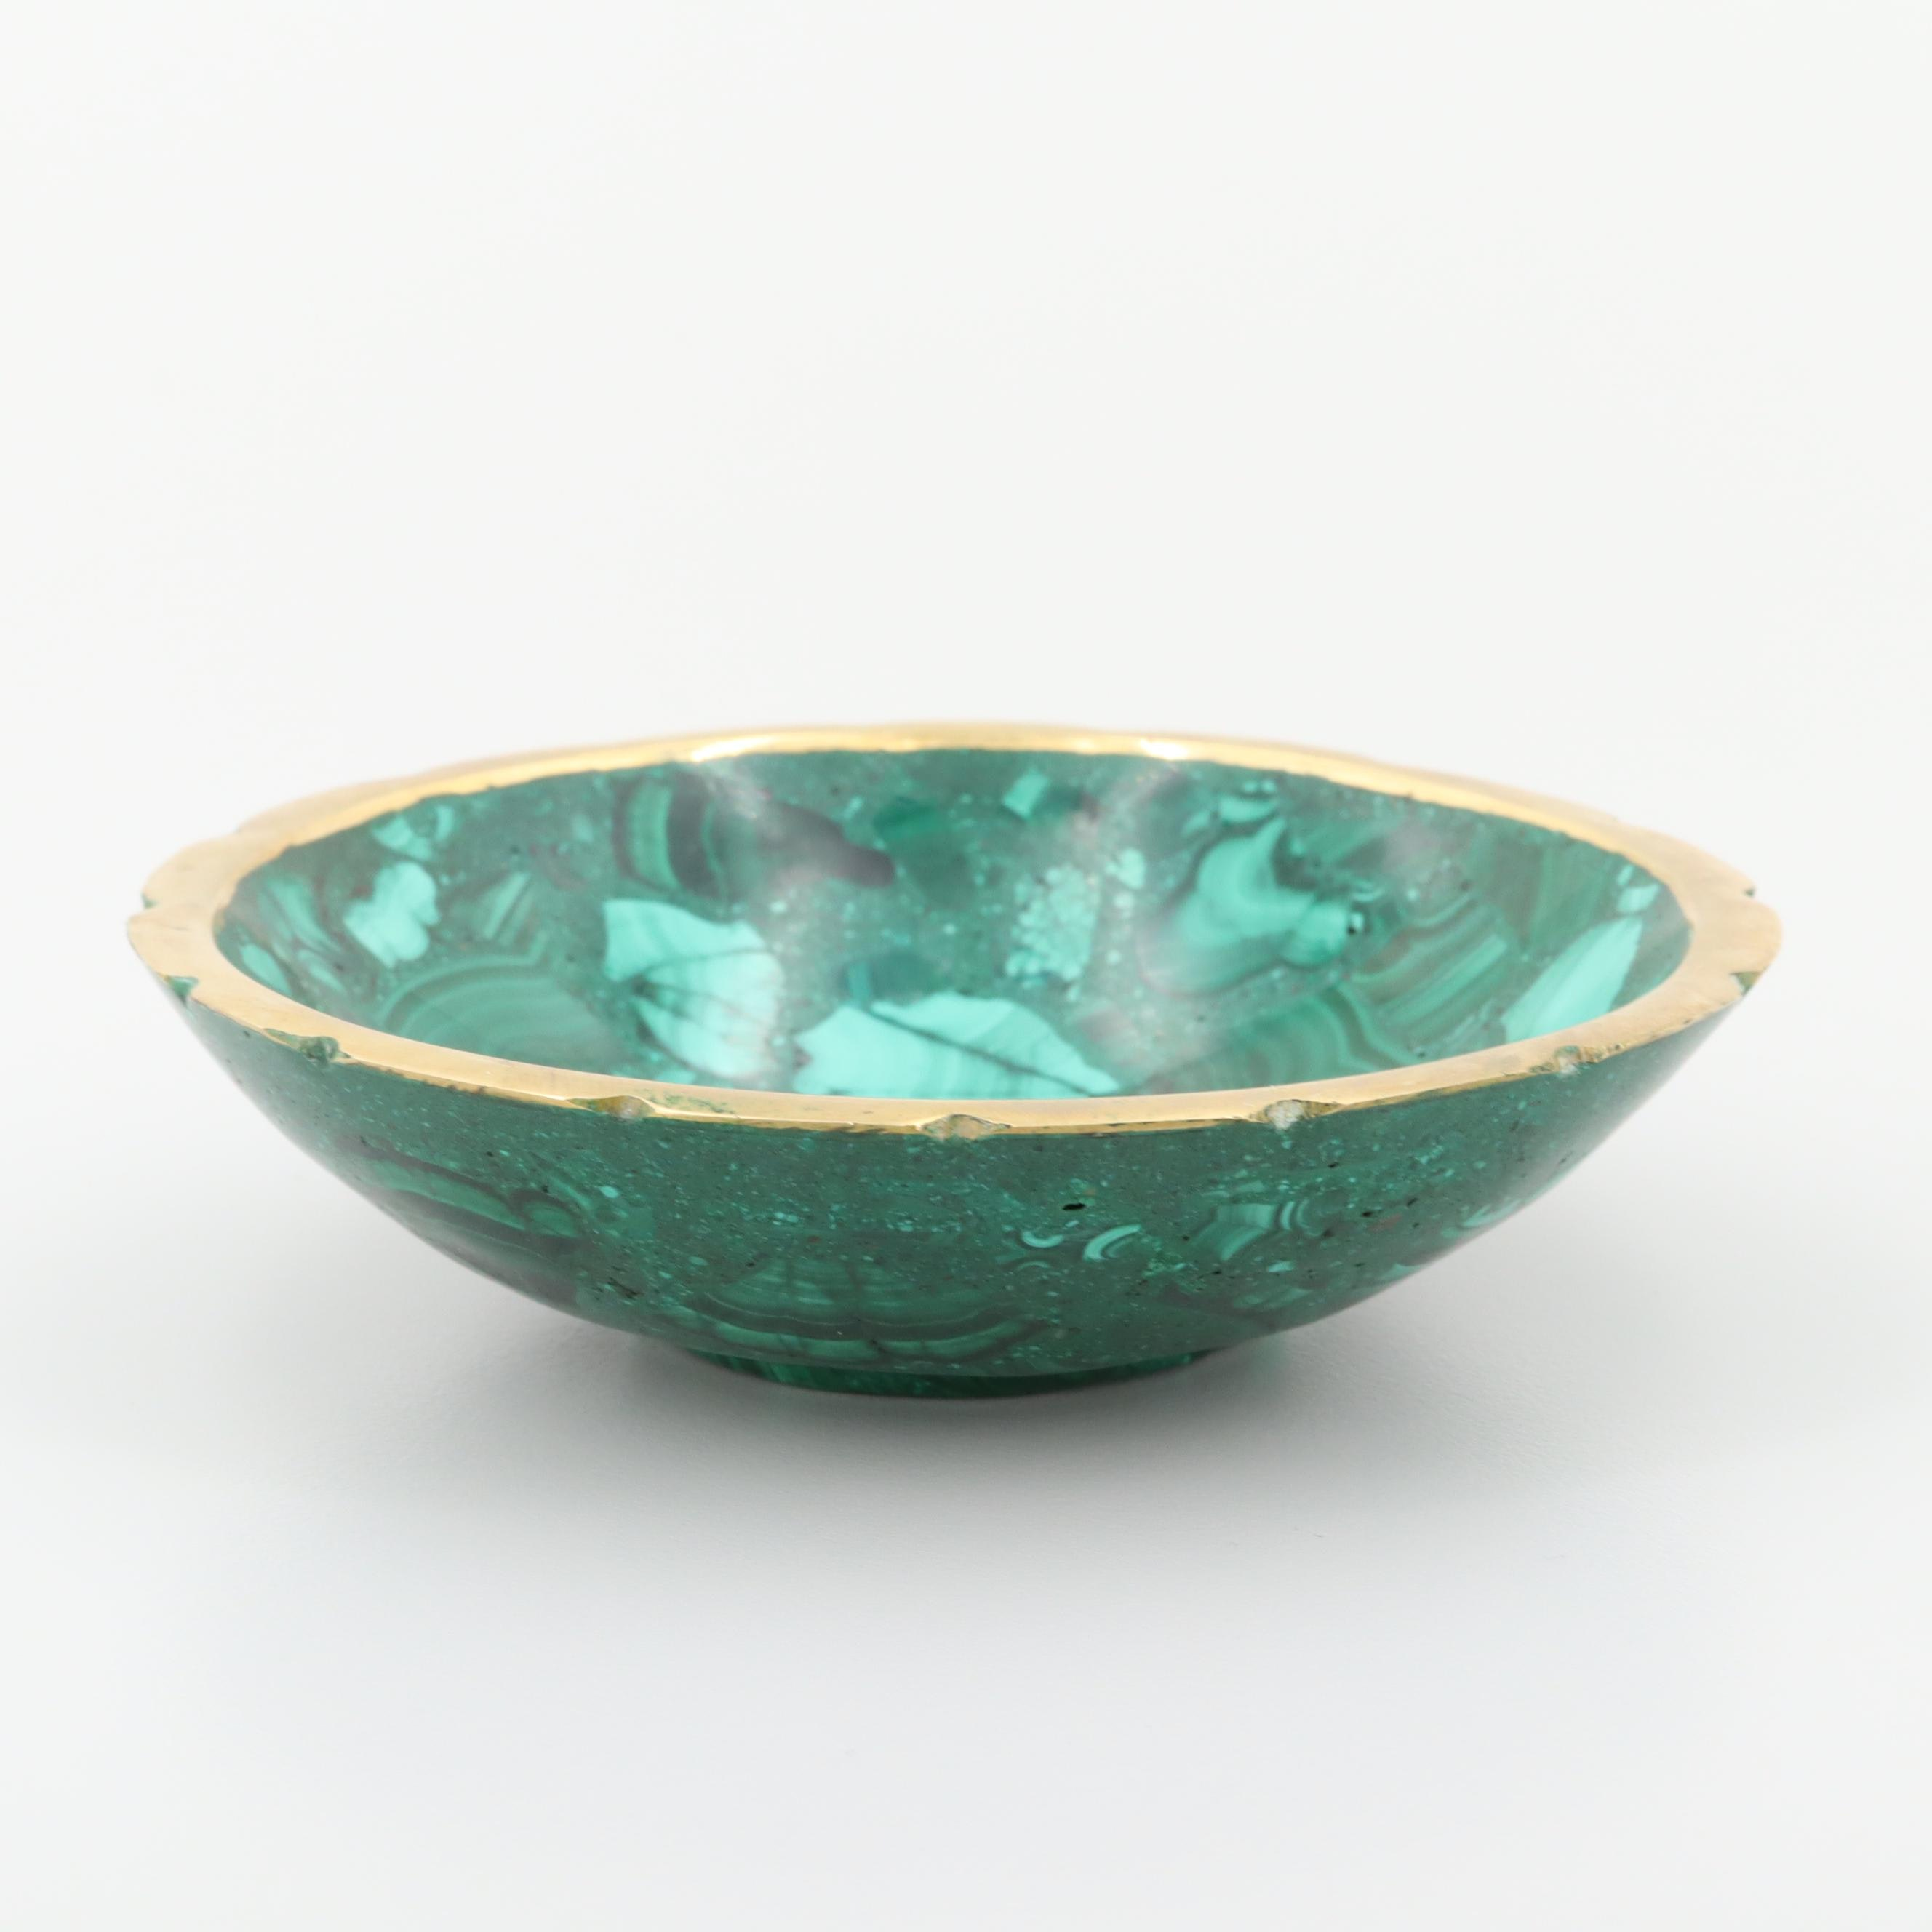 Malachite and Resin Bowl